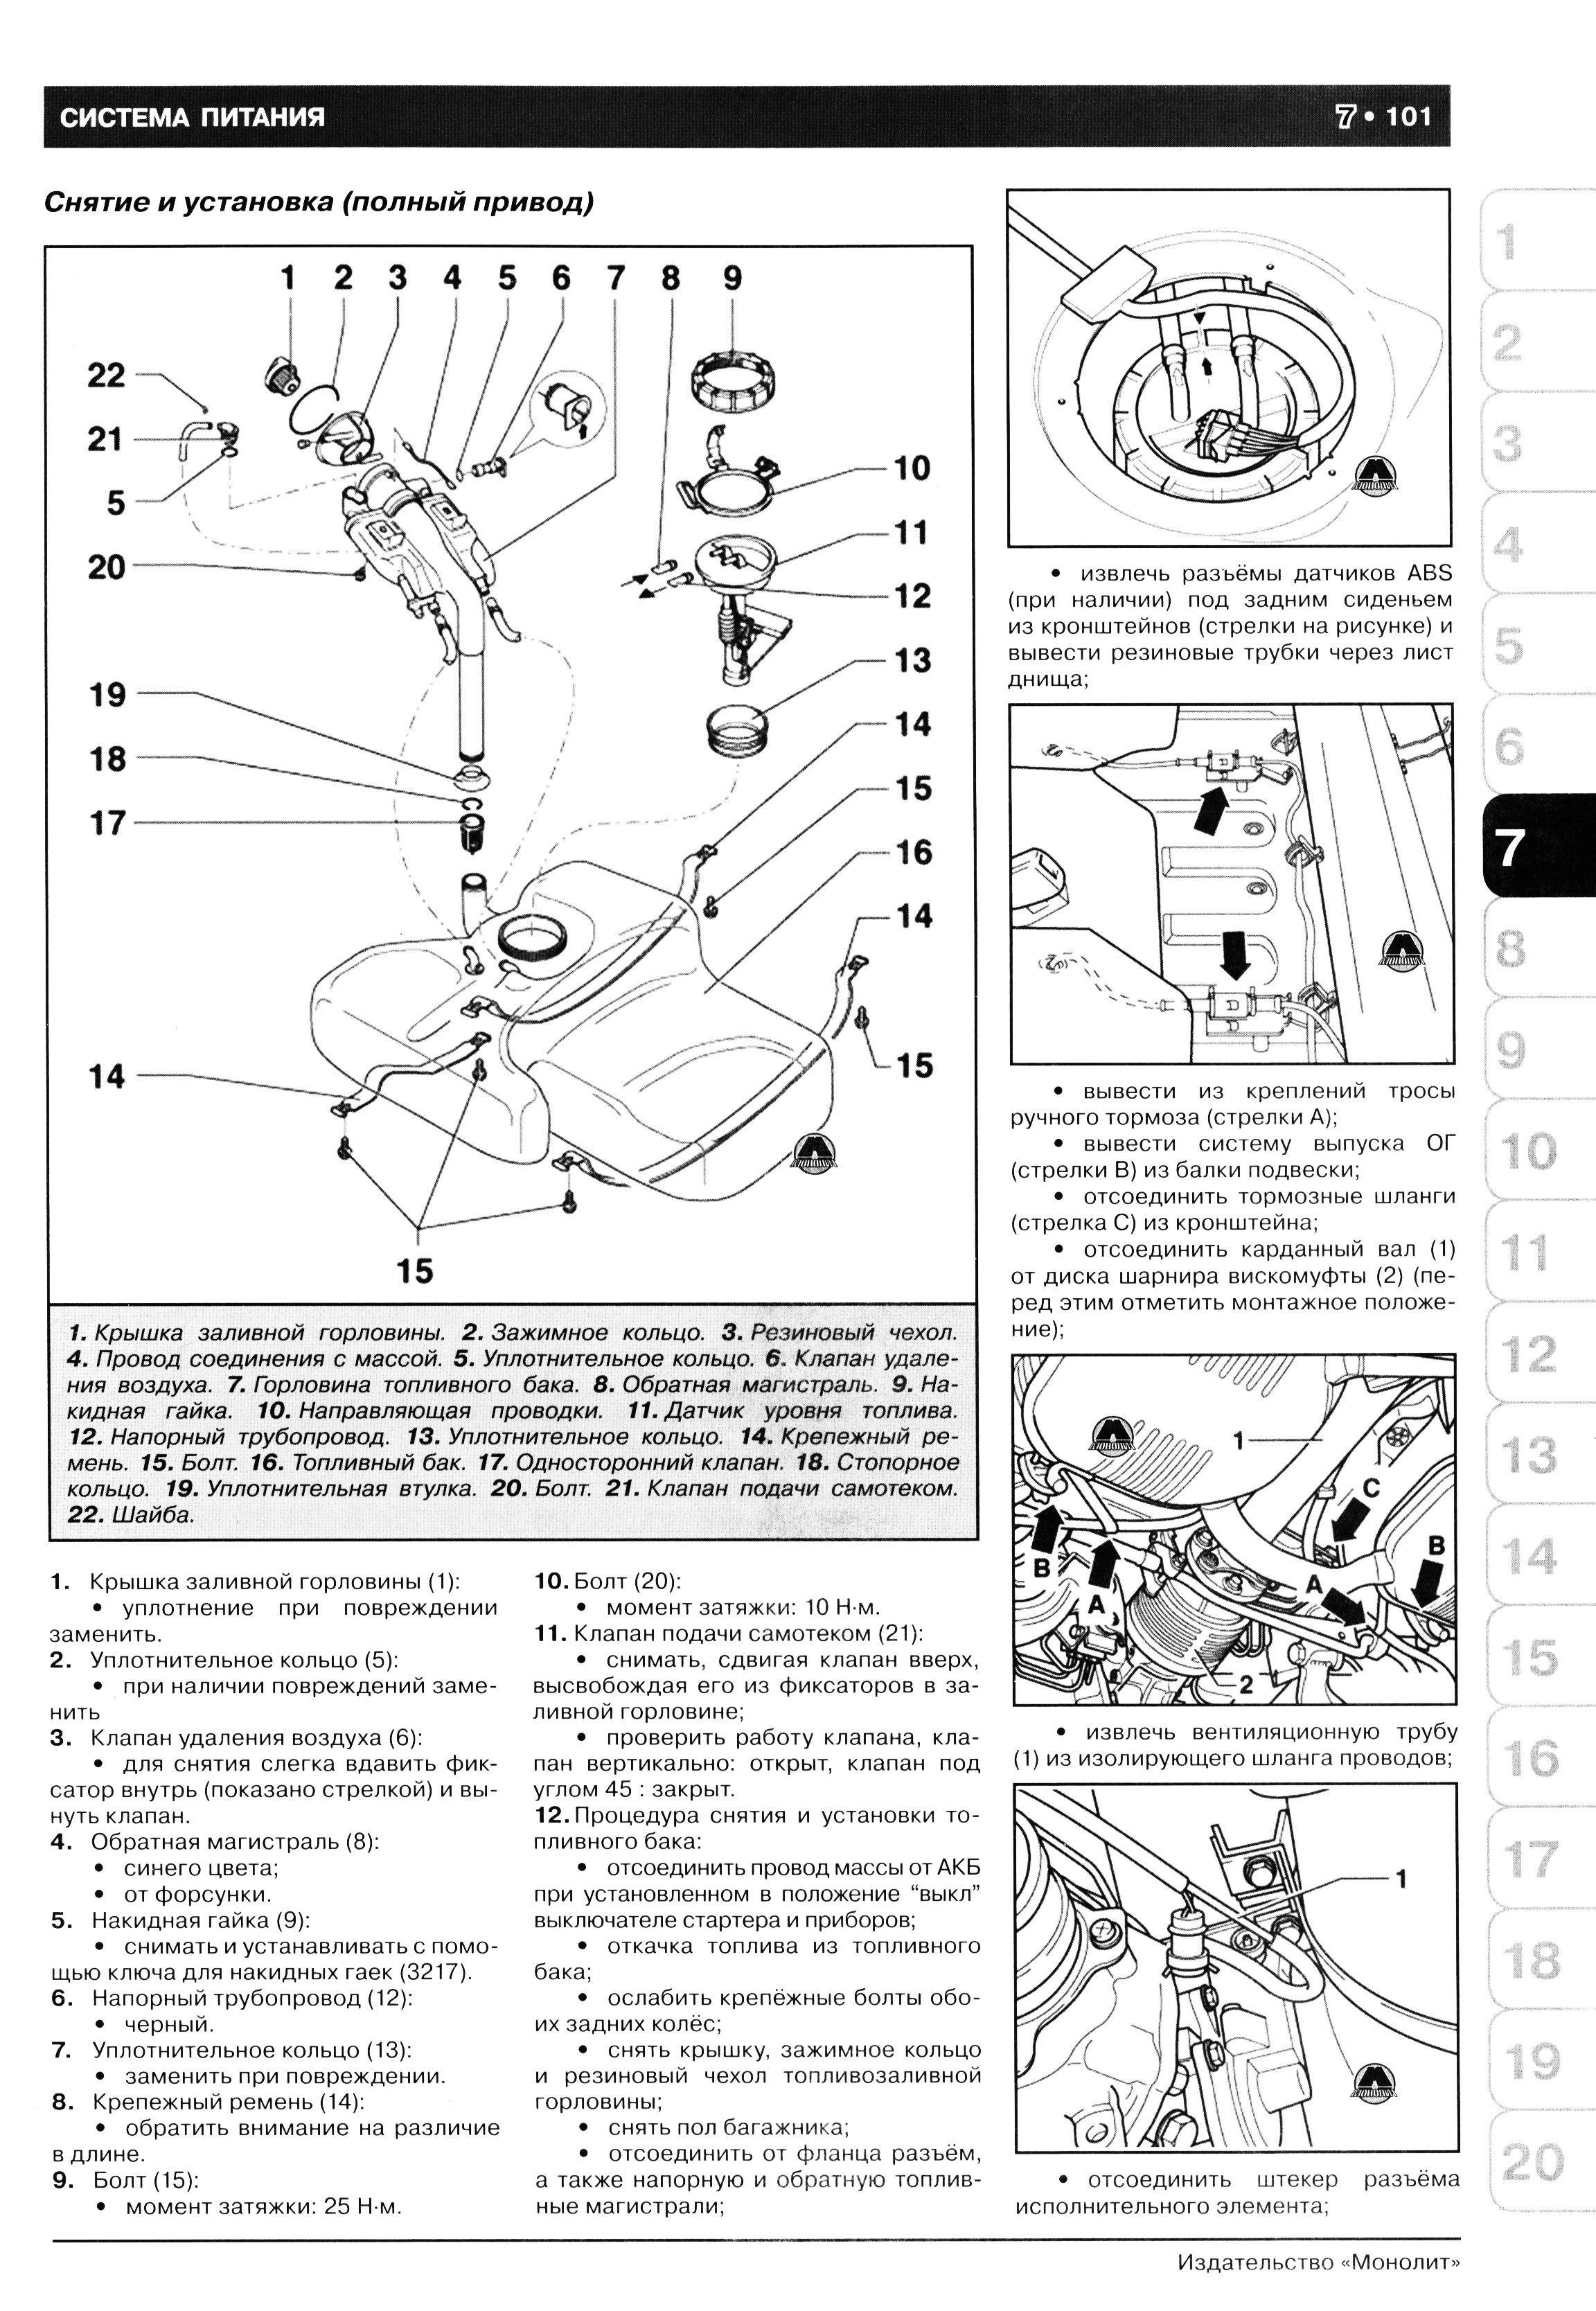 Руководство по ремонту VW Golf 3 | VW Vento с 1991 года